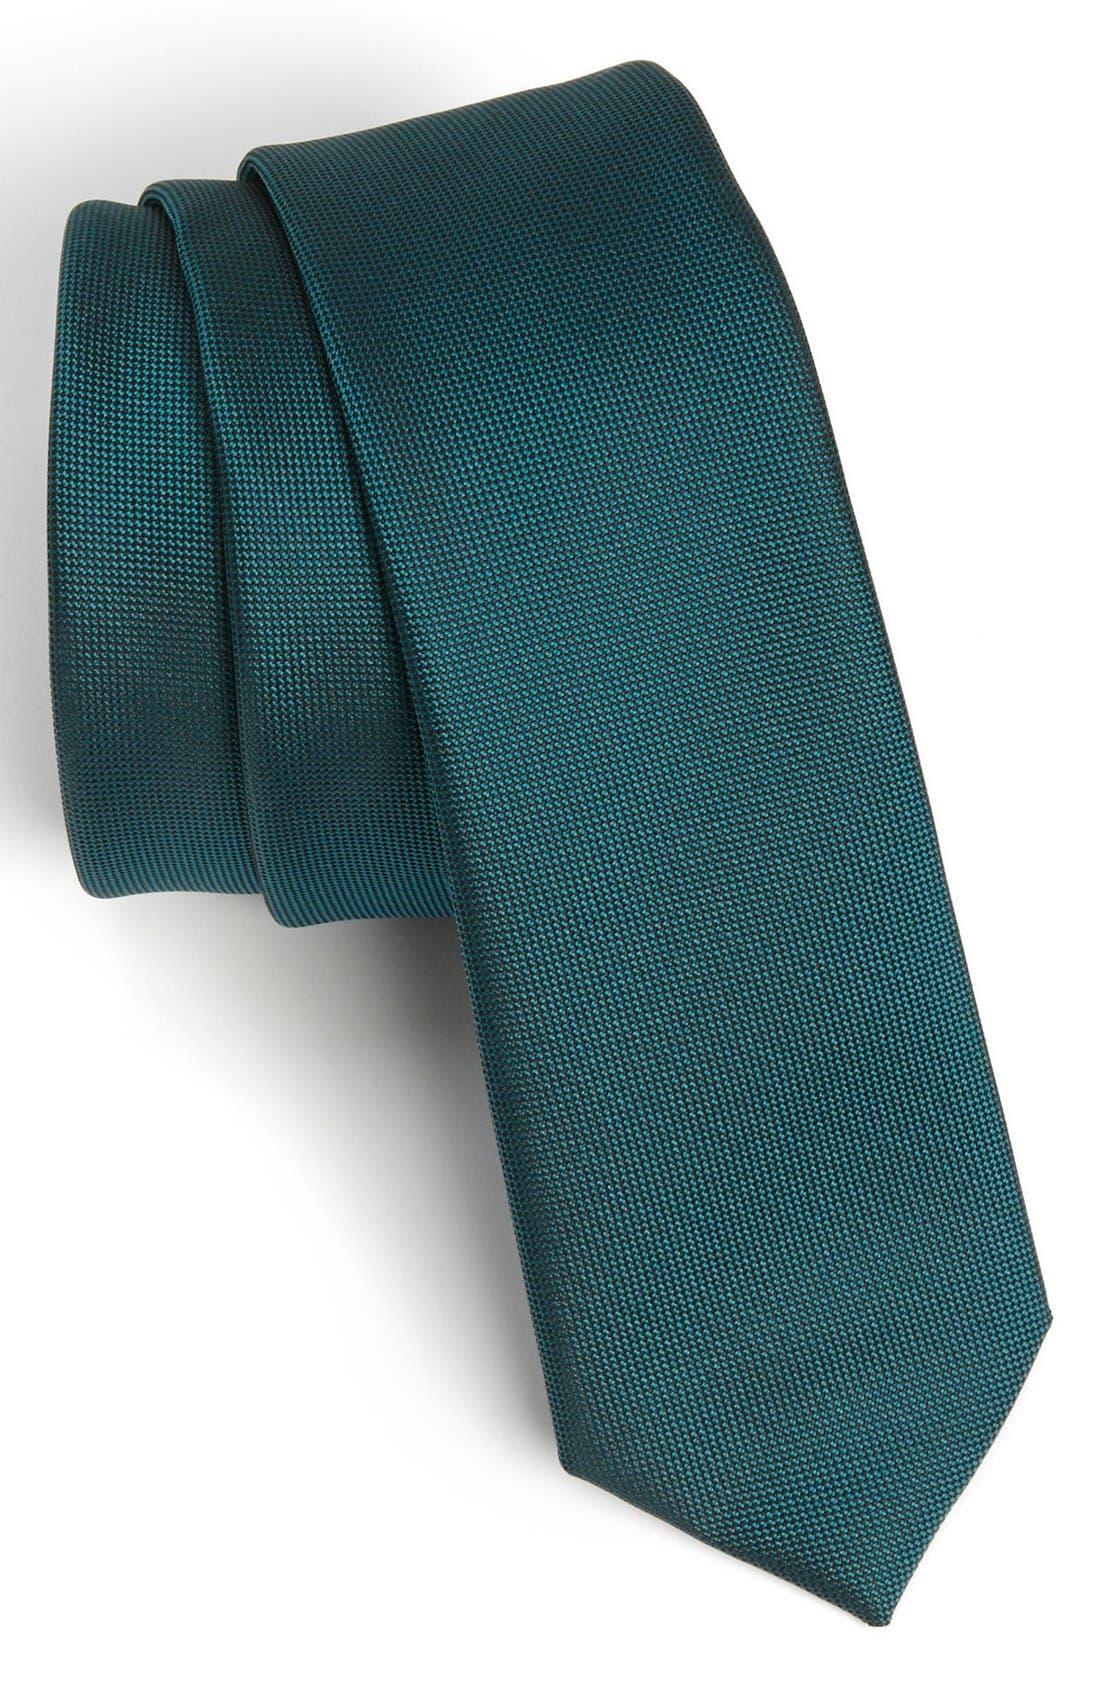 Main Image - Topman Skinny Tie